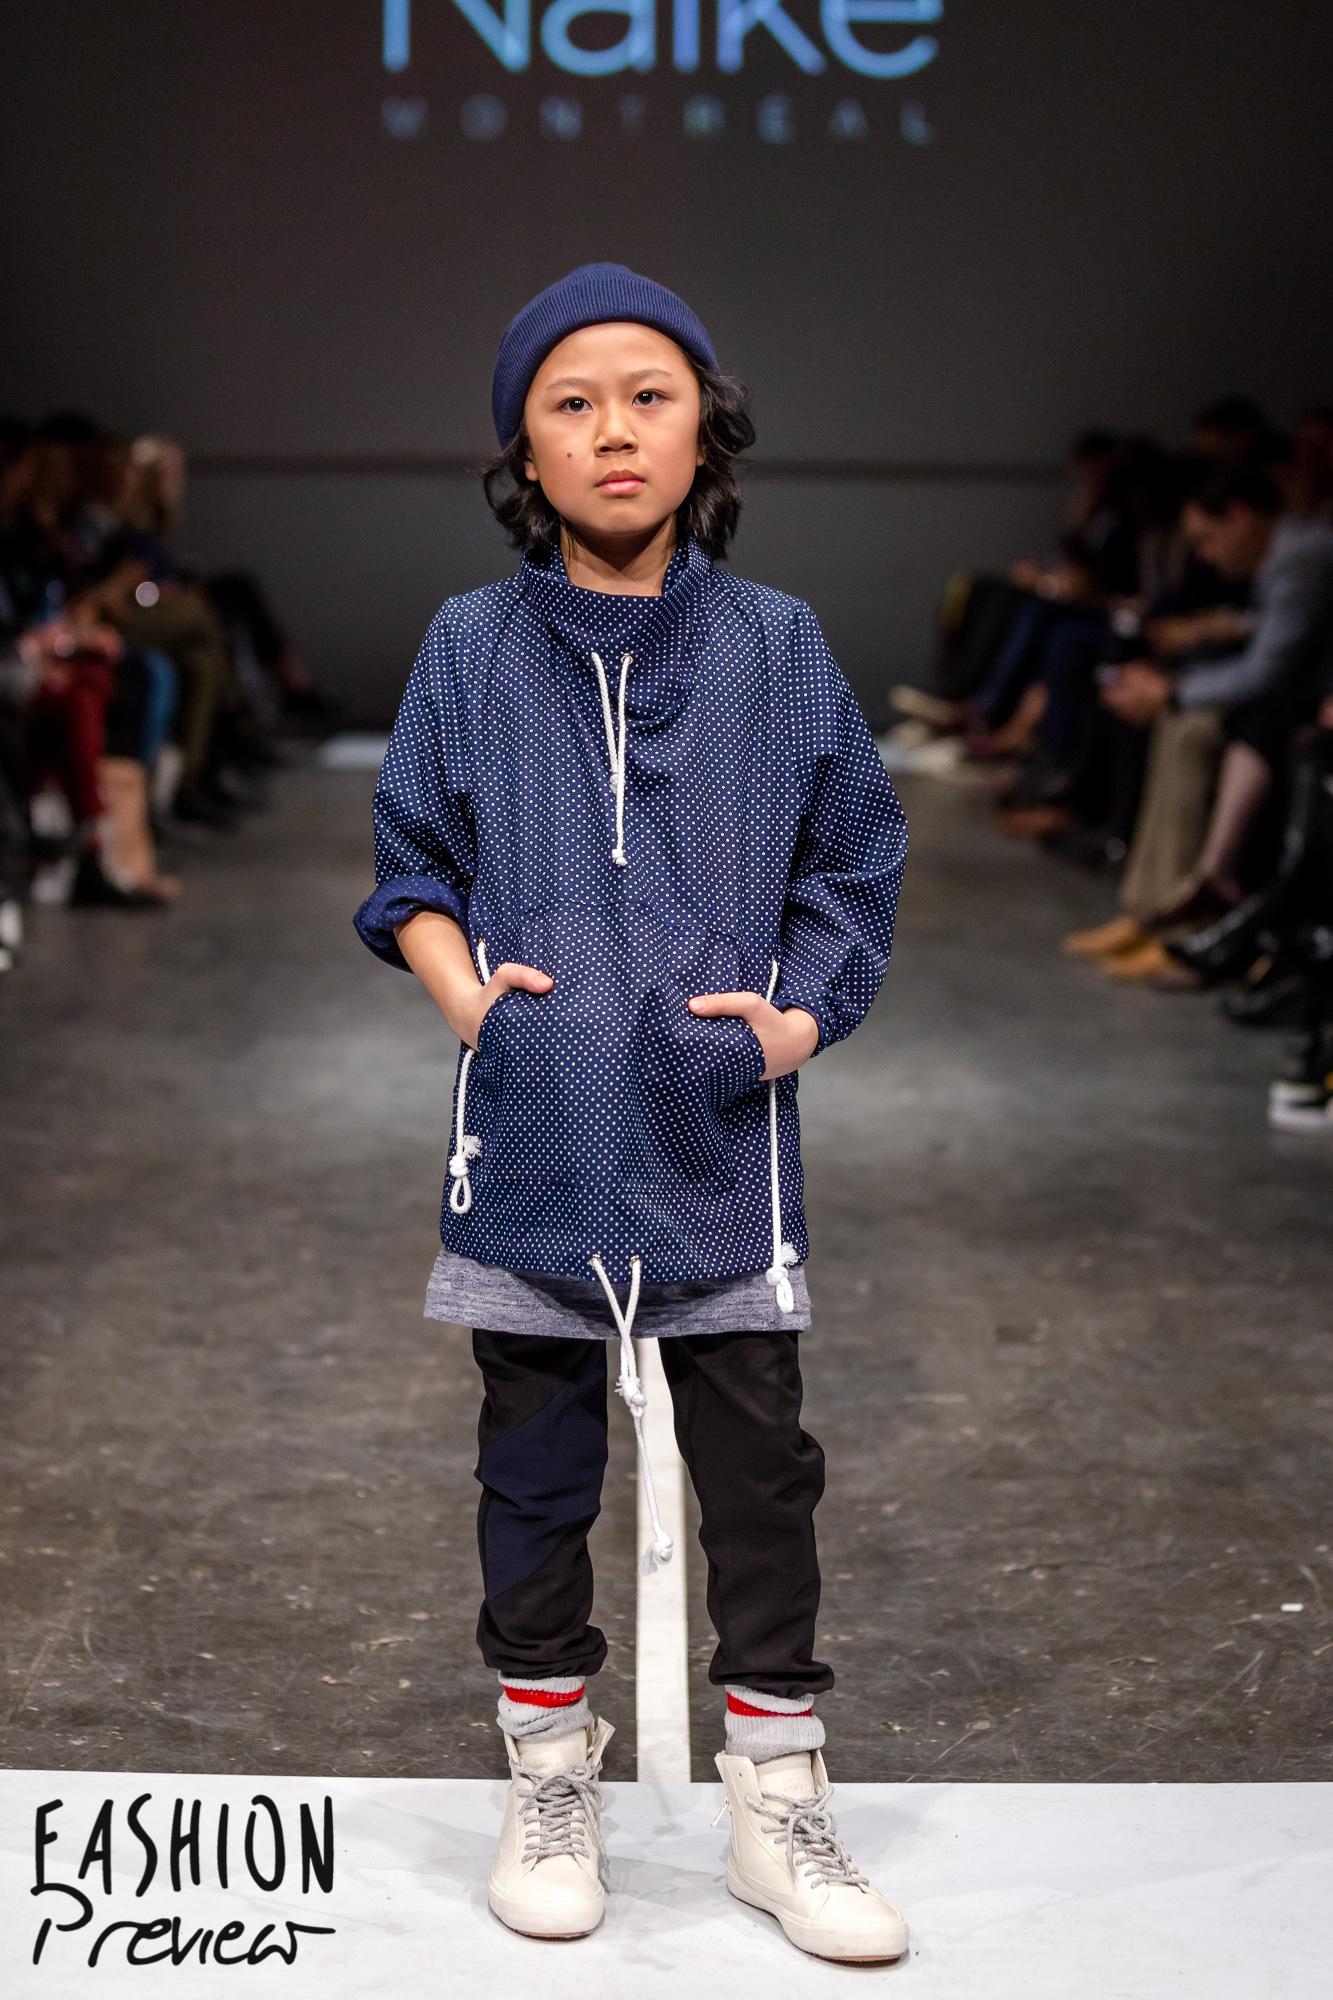 Fashion Preview 9 - Naike-18.jpg